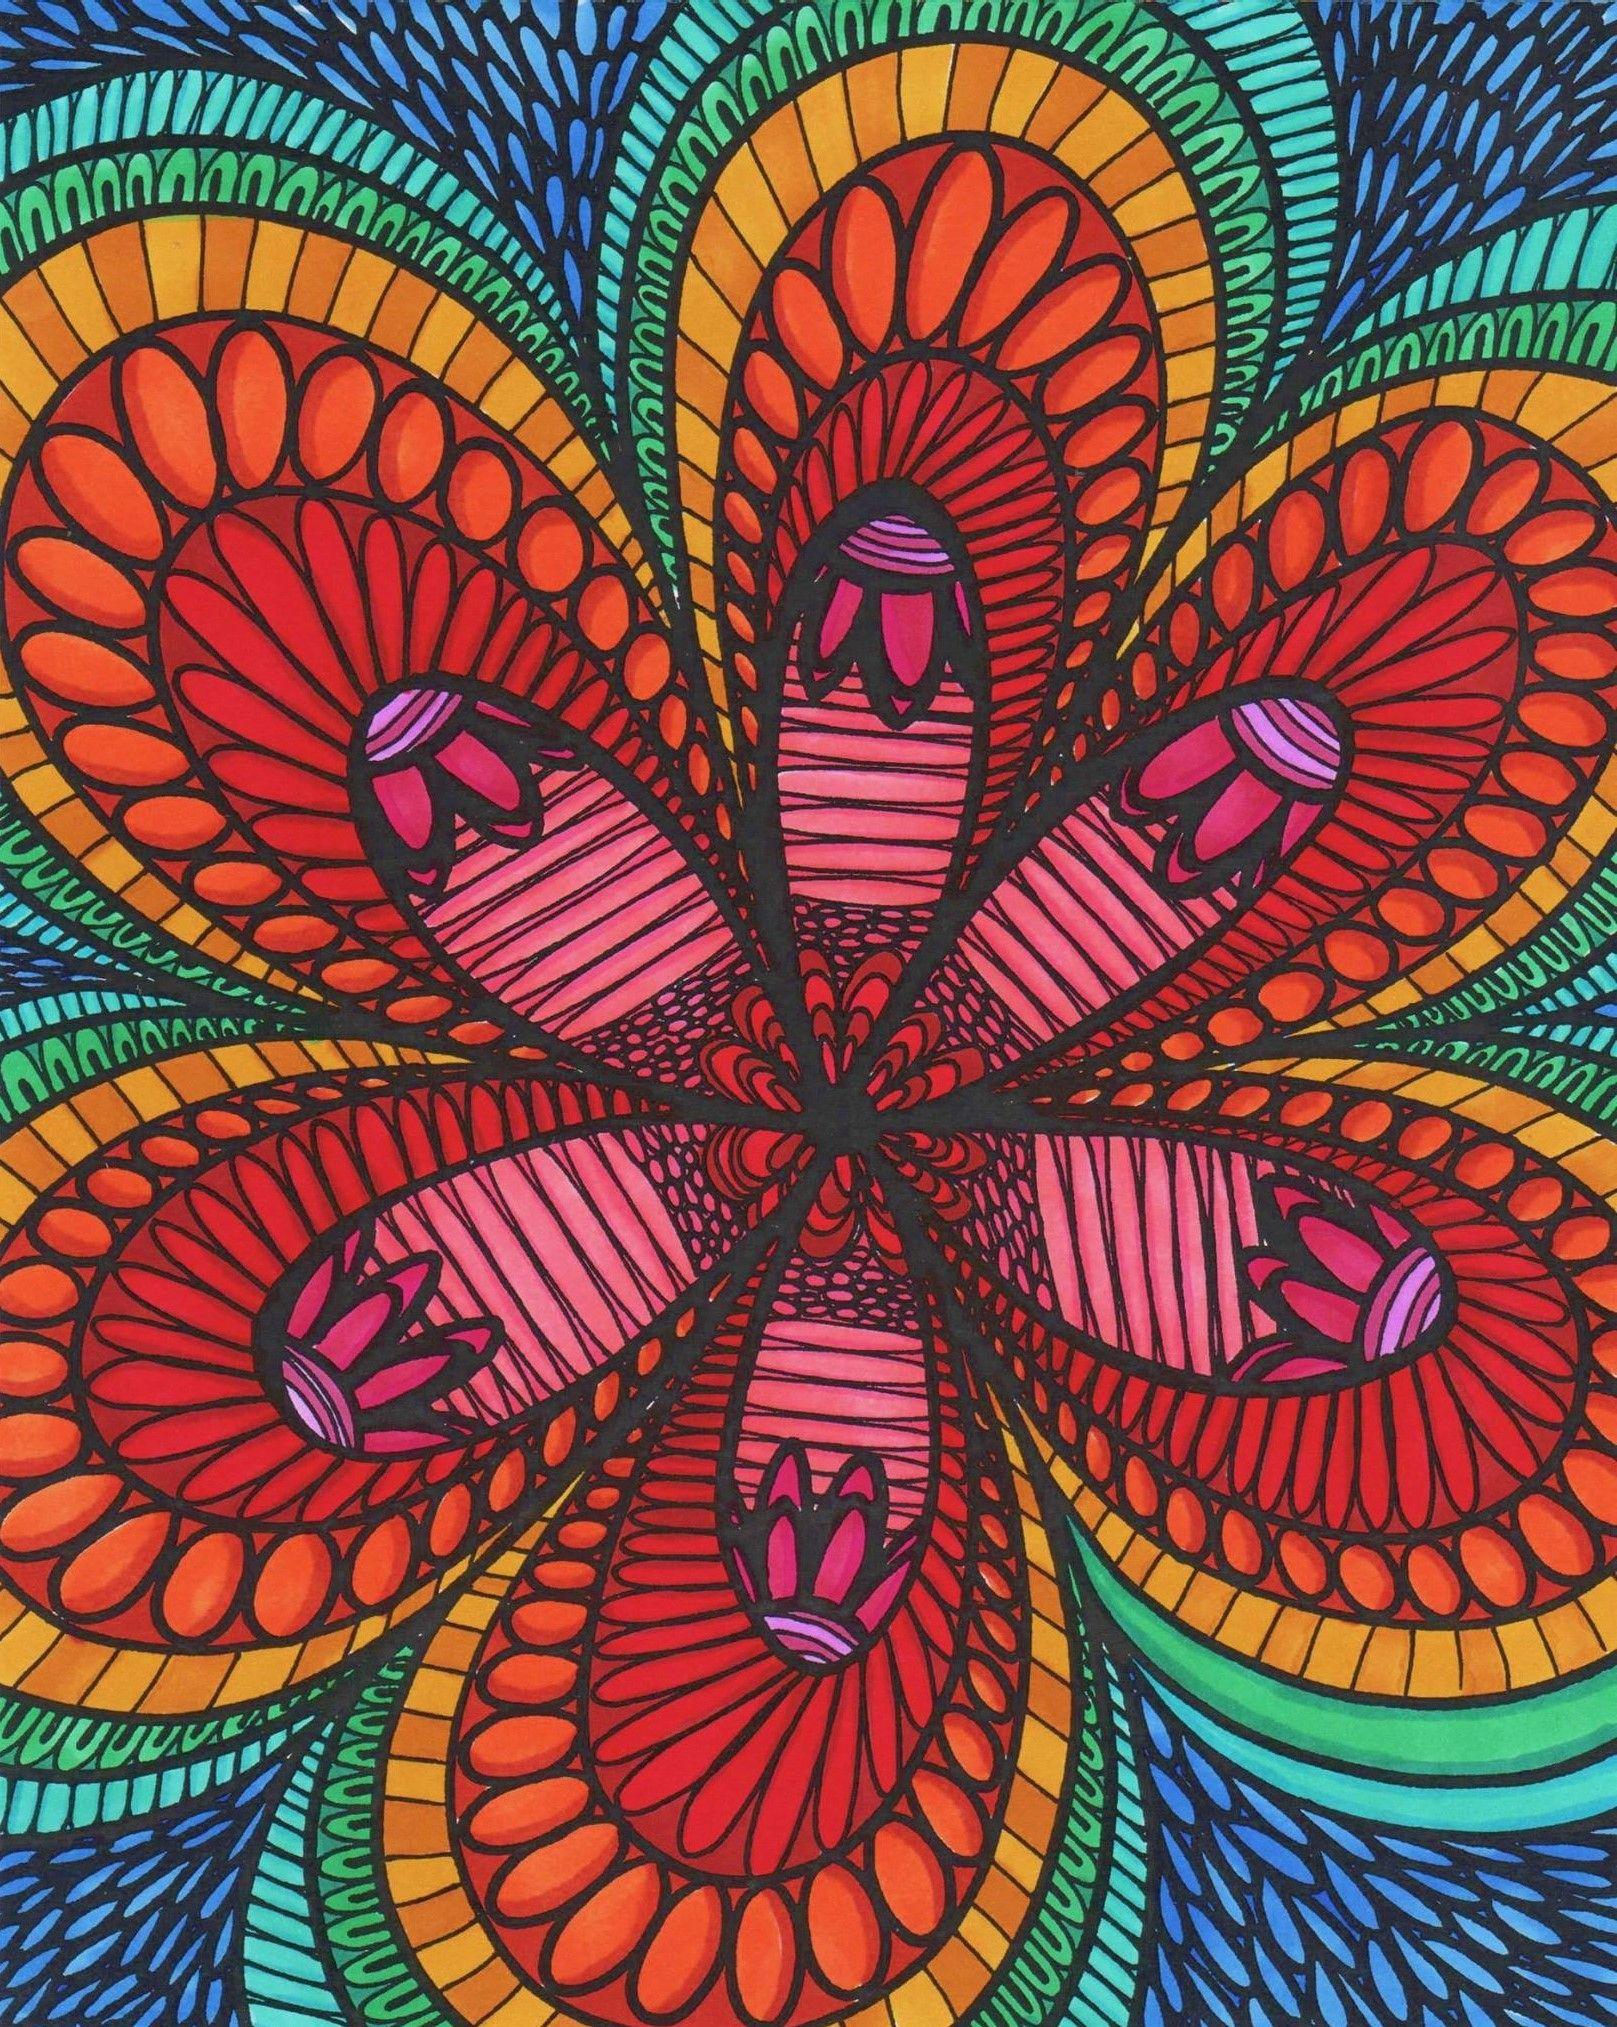 ColorIt Colorful Flowers Volume 1 Colorist: Lorrie Palmer ...